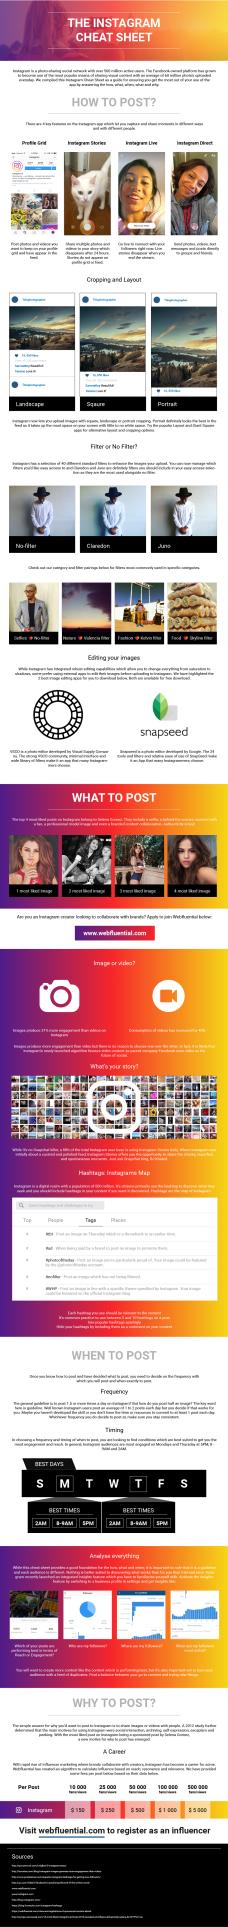 instagram-cheat-sheet-1